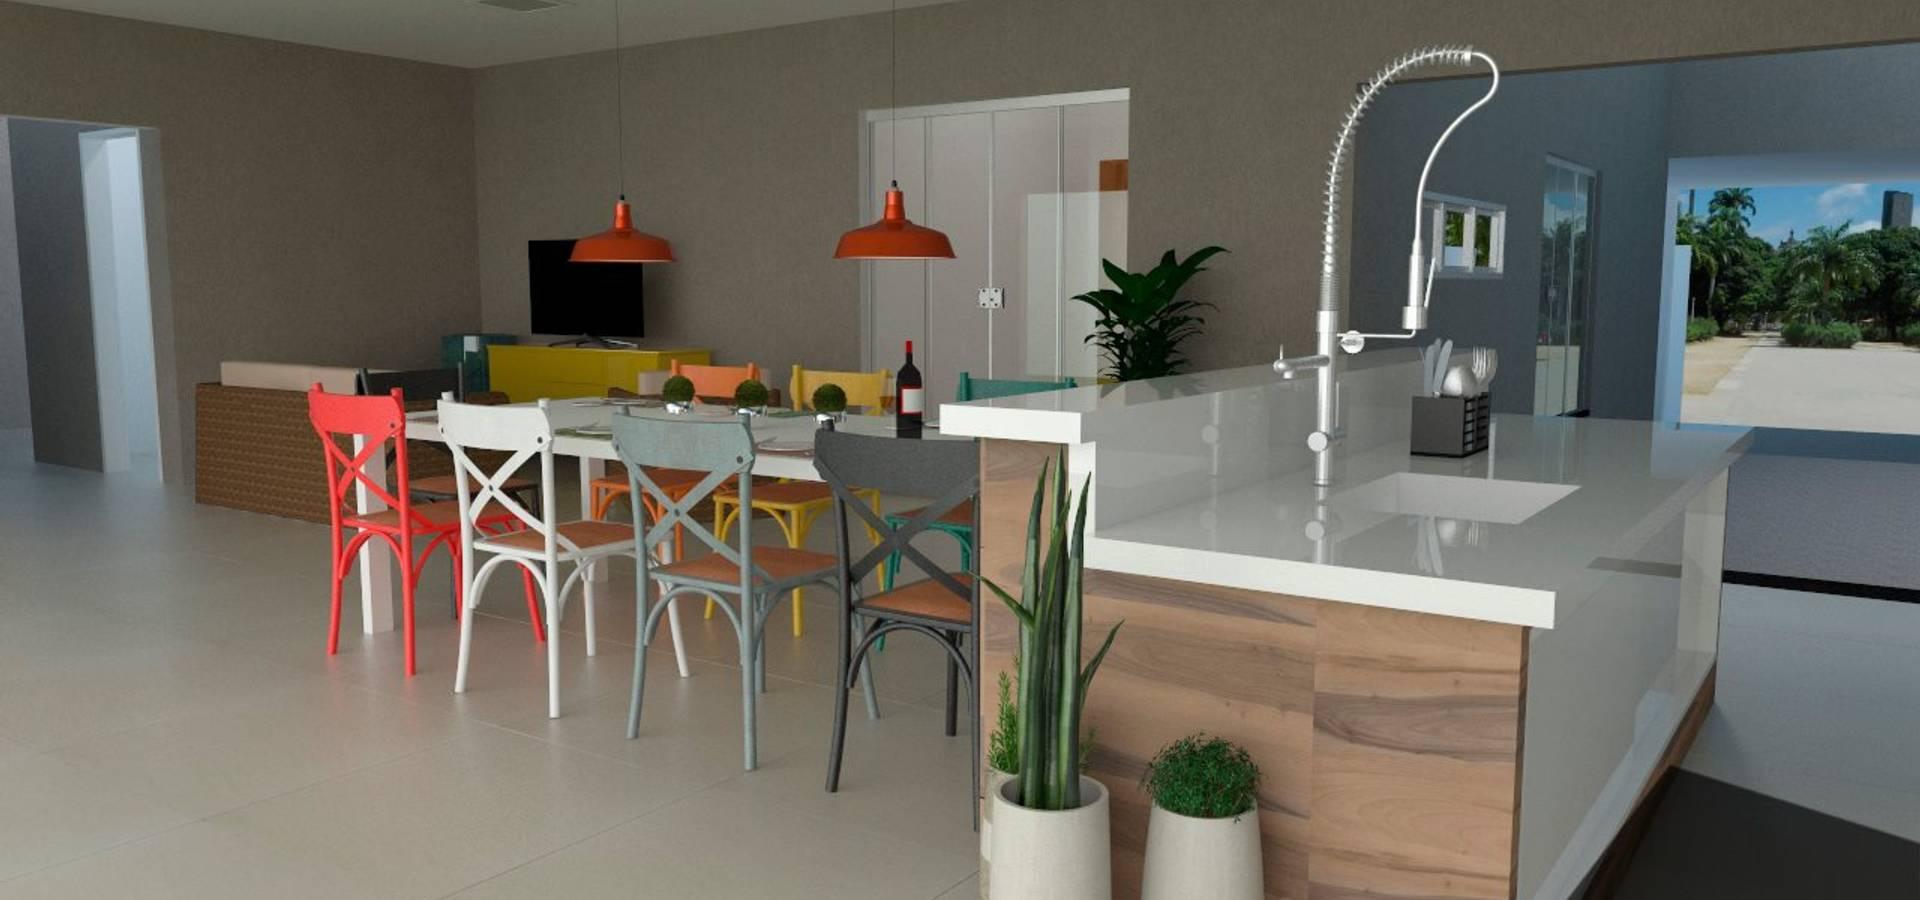 Studio A3 Arquitetura